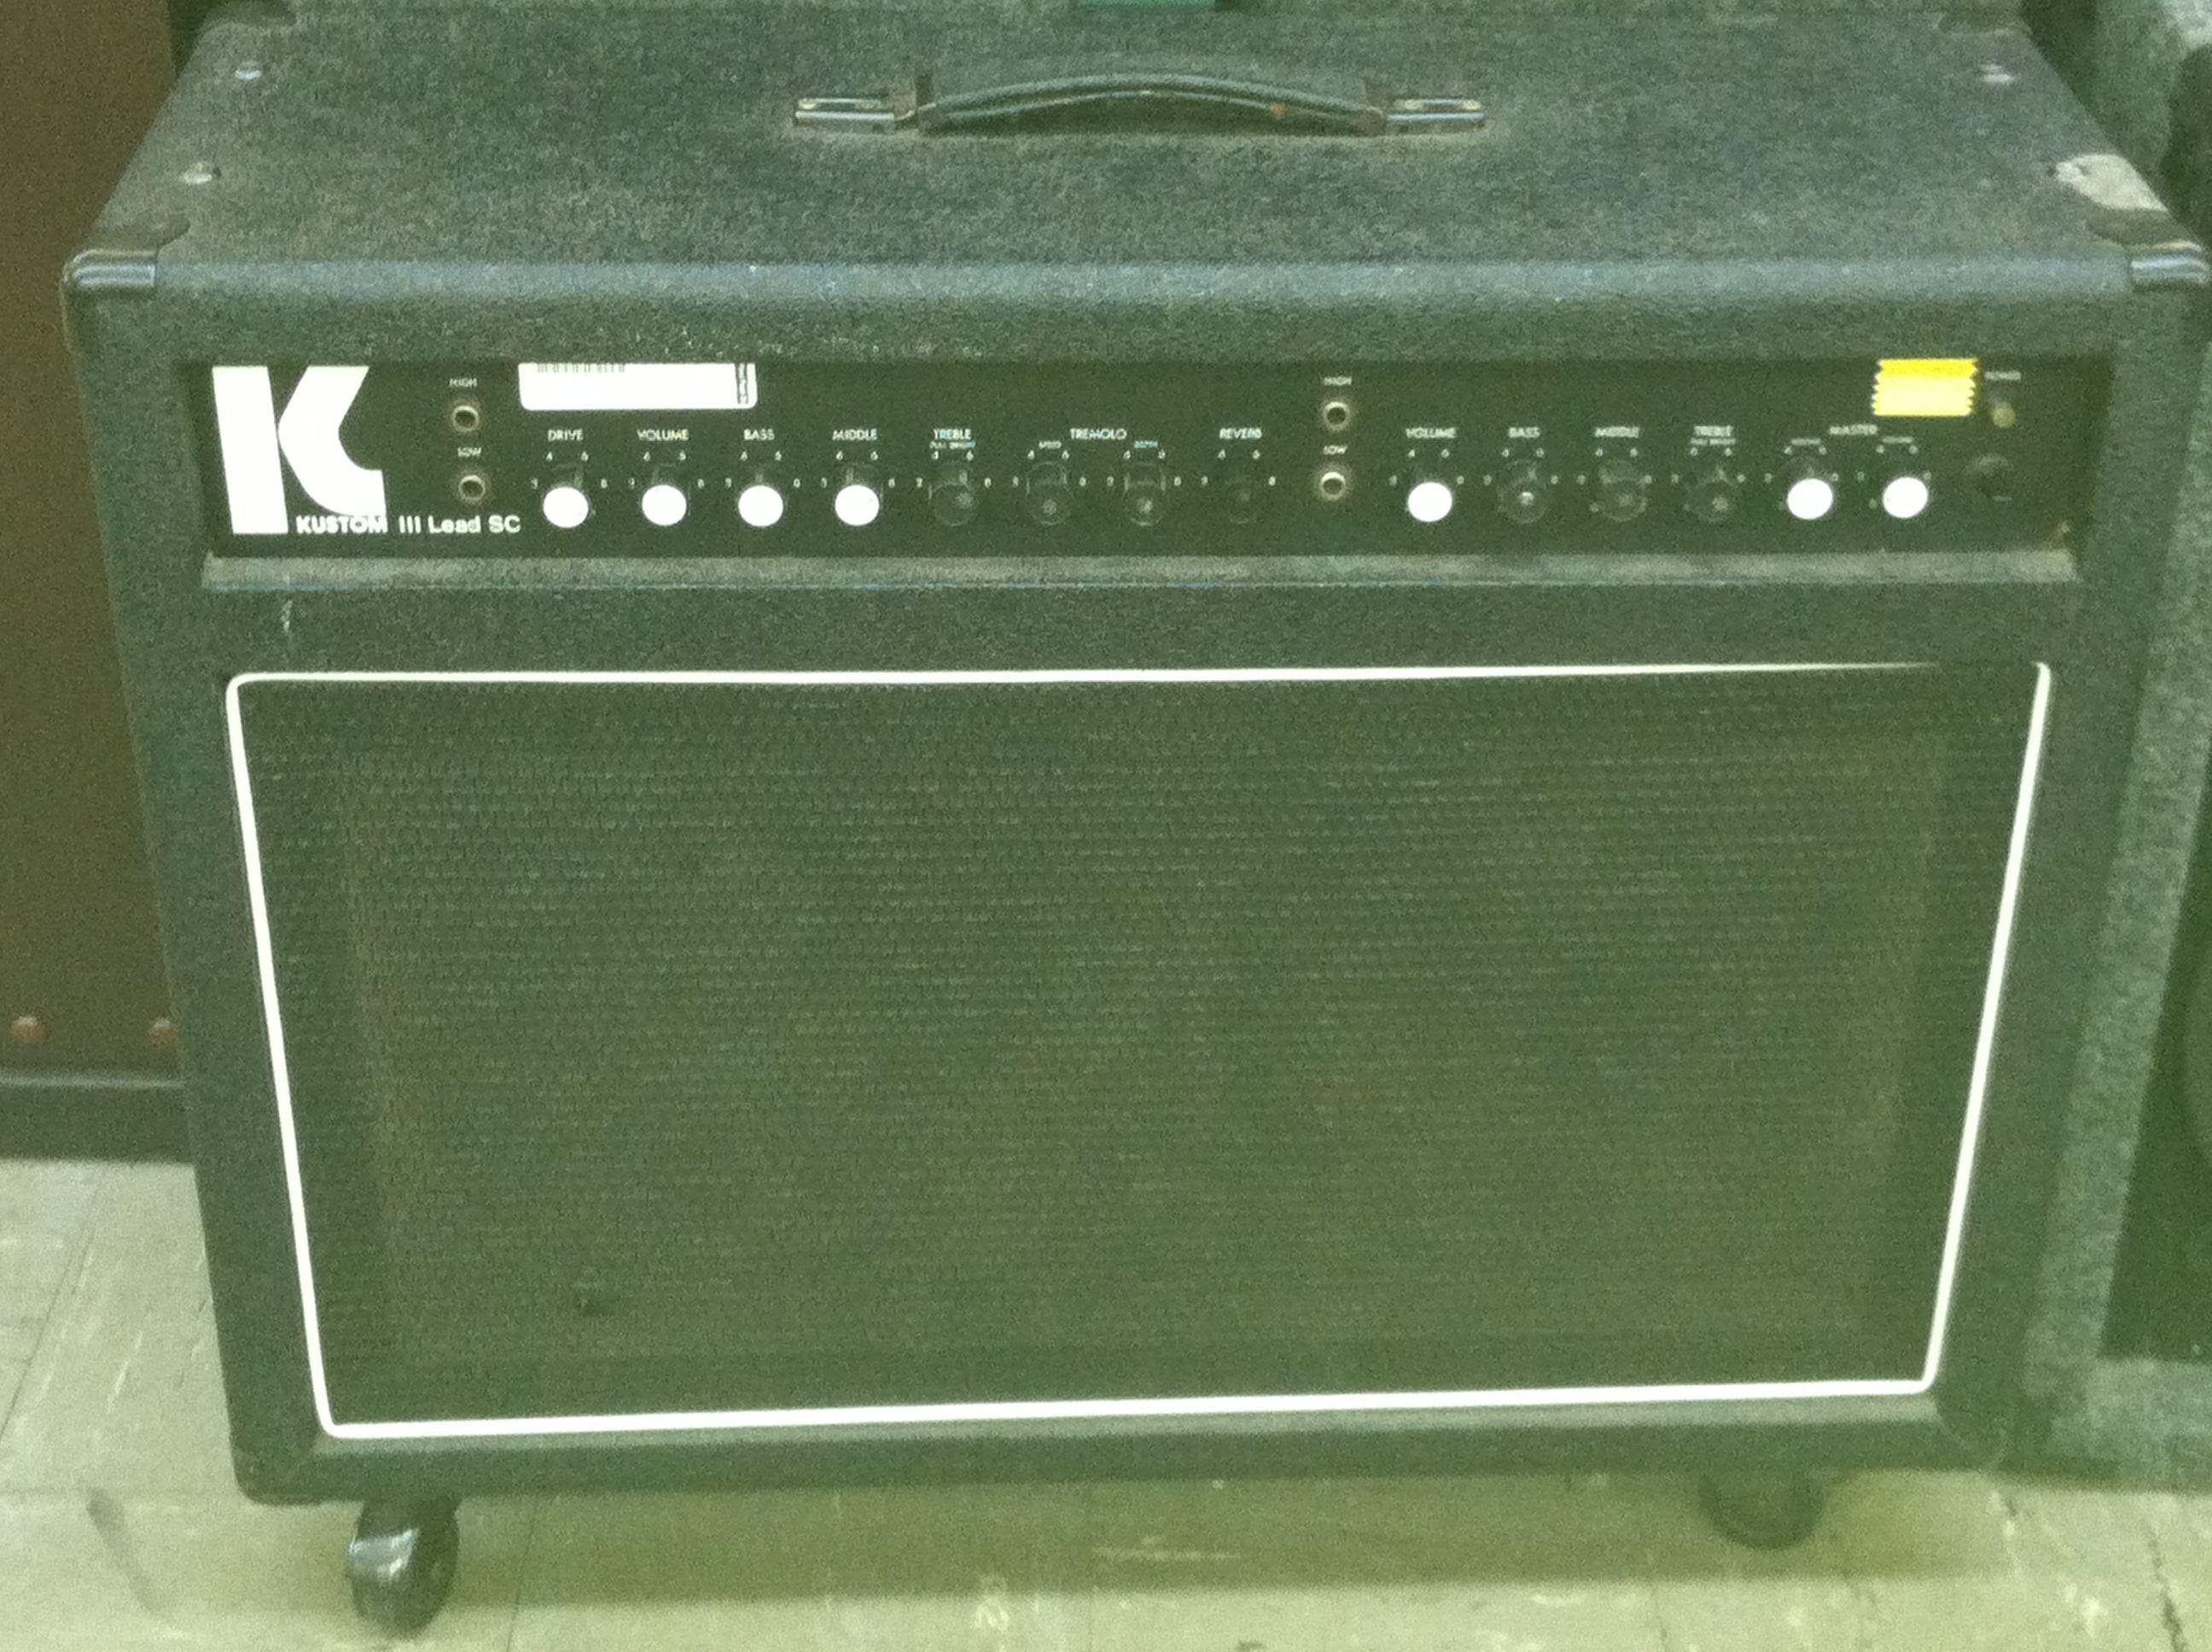 Kustom Iii Lead Sc Amp 25995 Musical Equipment Musicals Repair Schematics Fender Bassman Ab165 Schematic